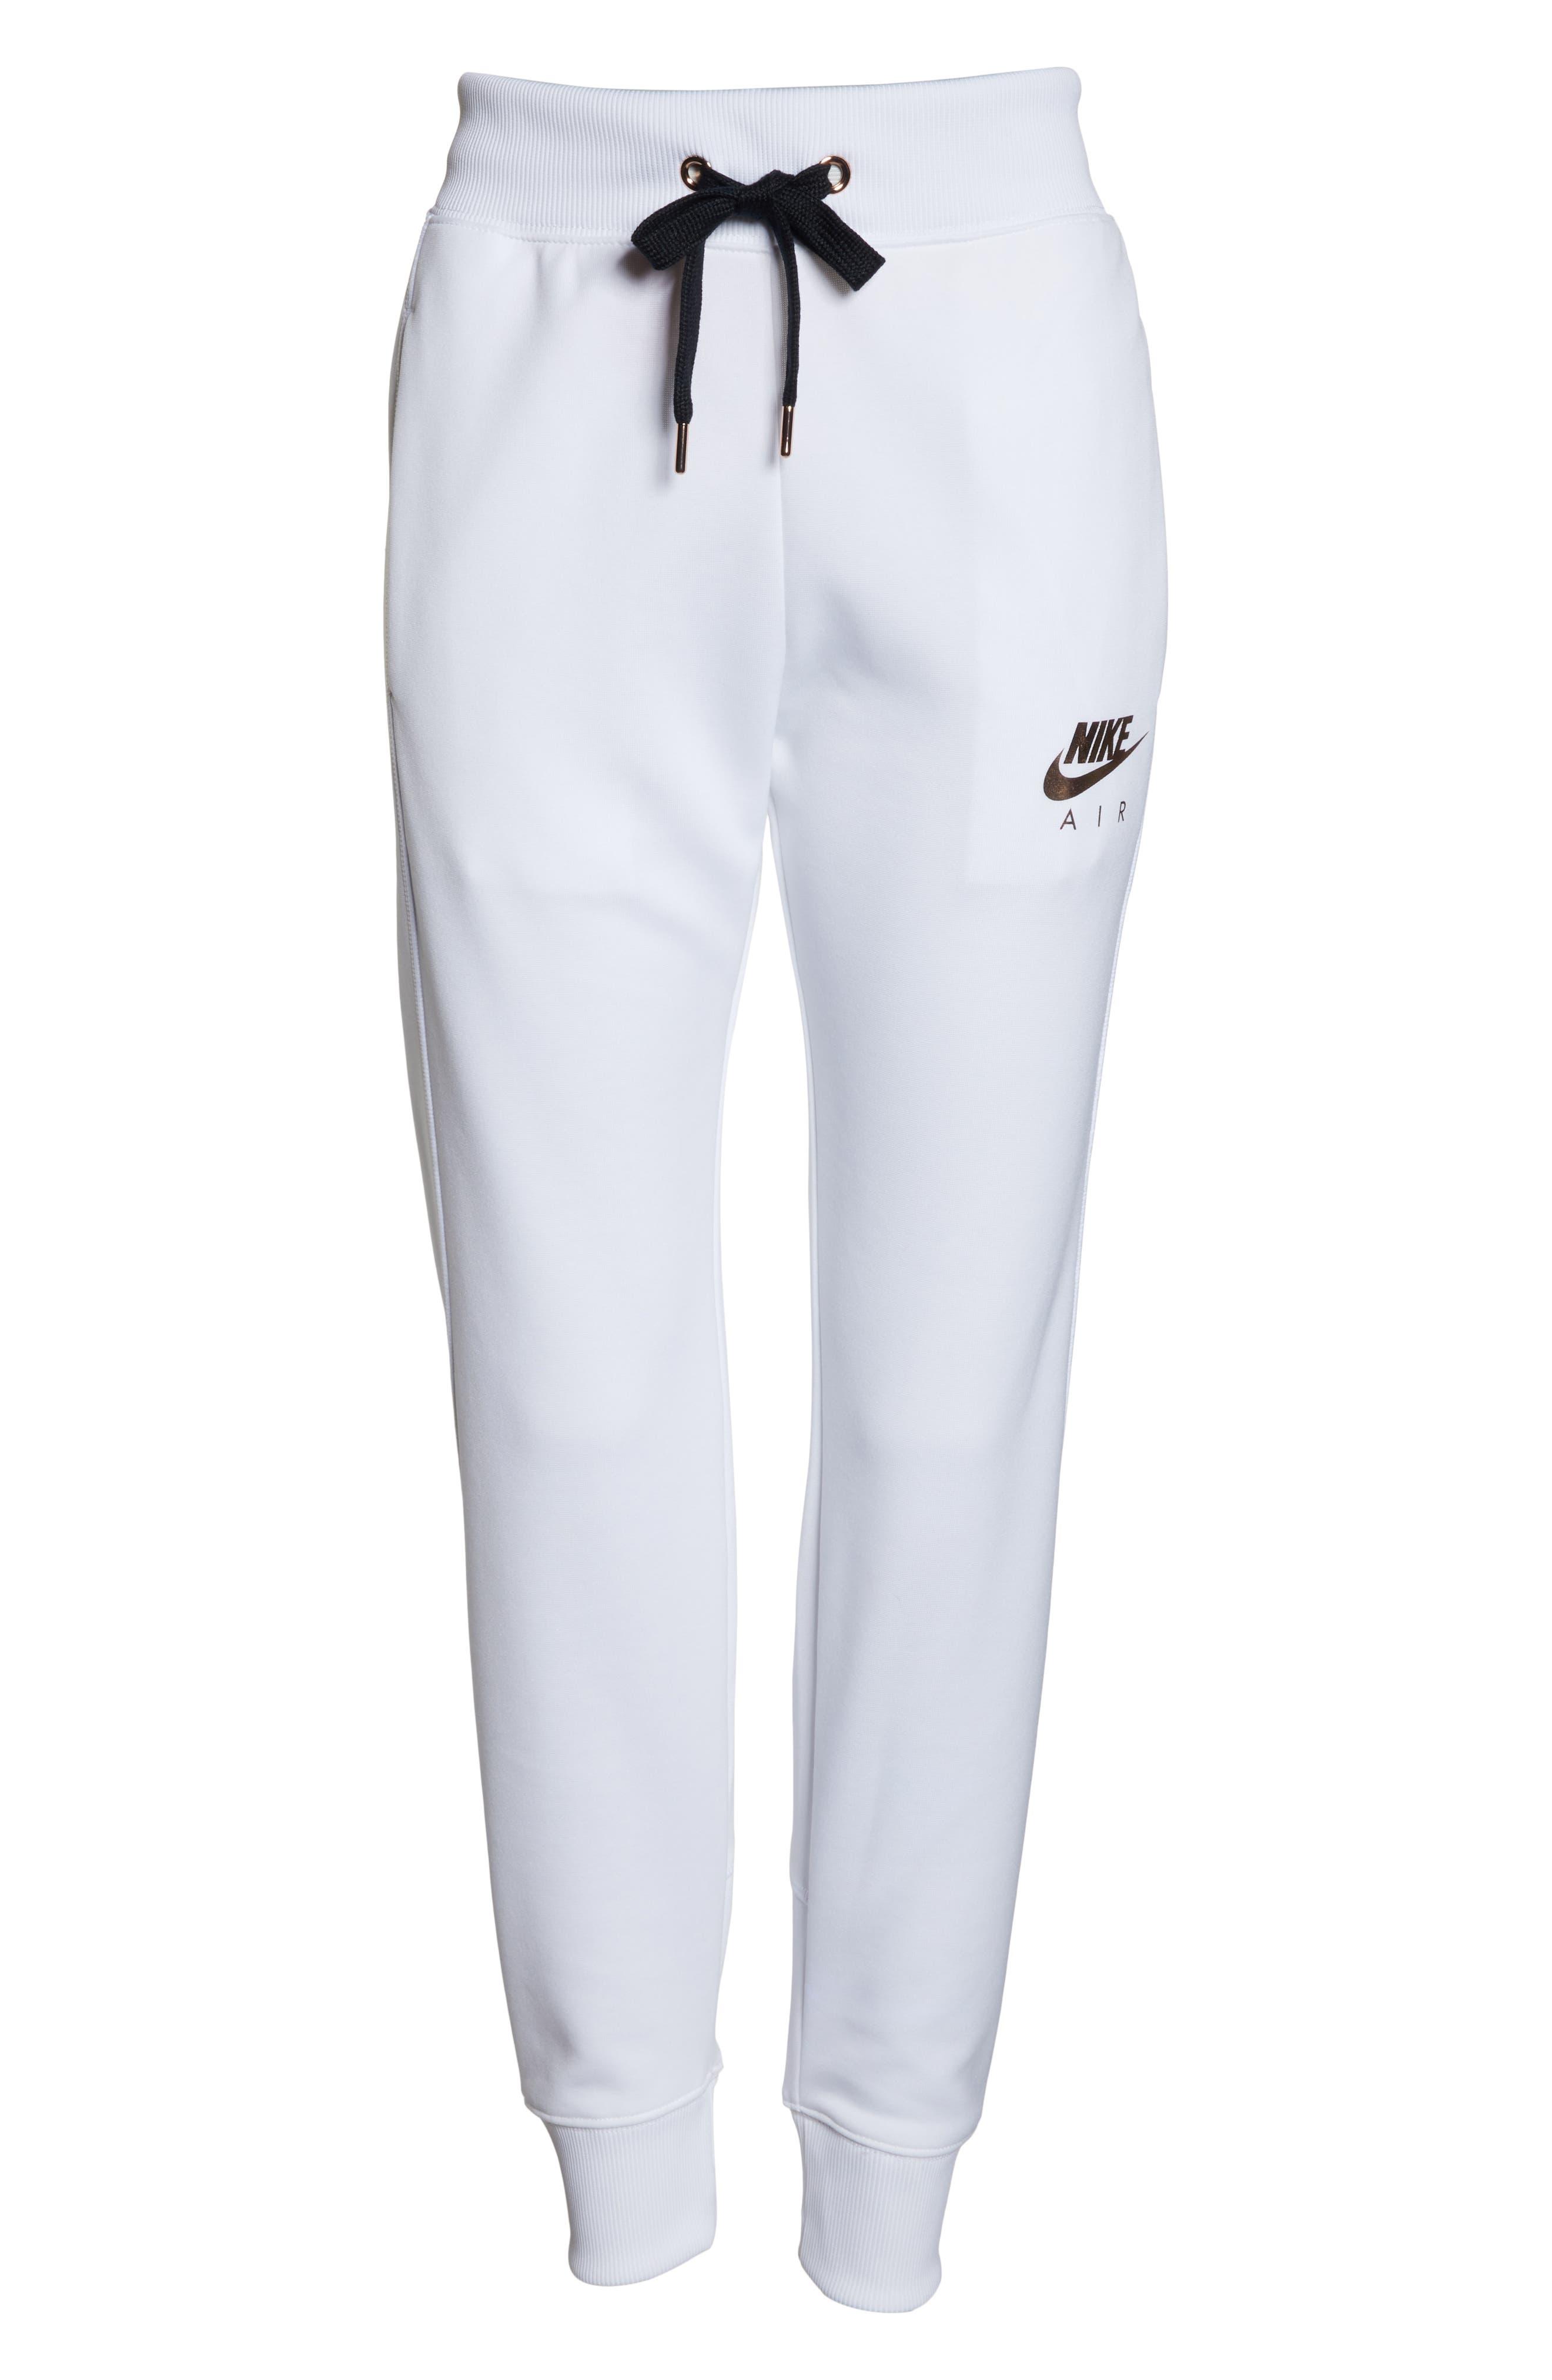 Sportswear Air Jogger Pants,                             Alternate thumbnail 7, color,                             WHITE/ ROSE GOLD/ BLACK